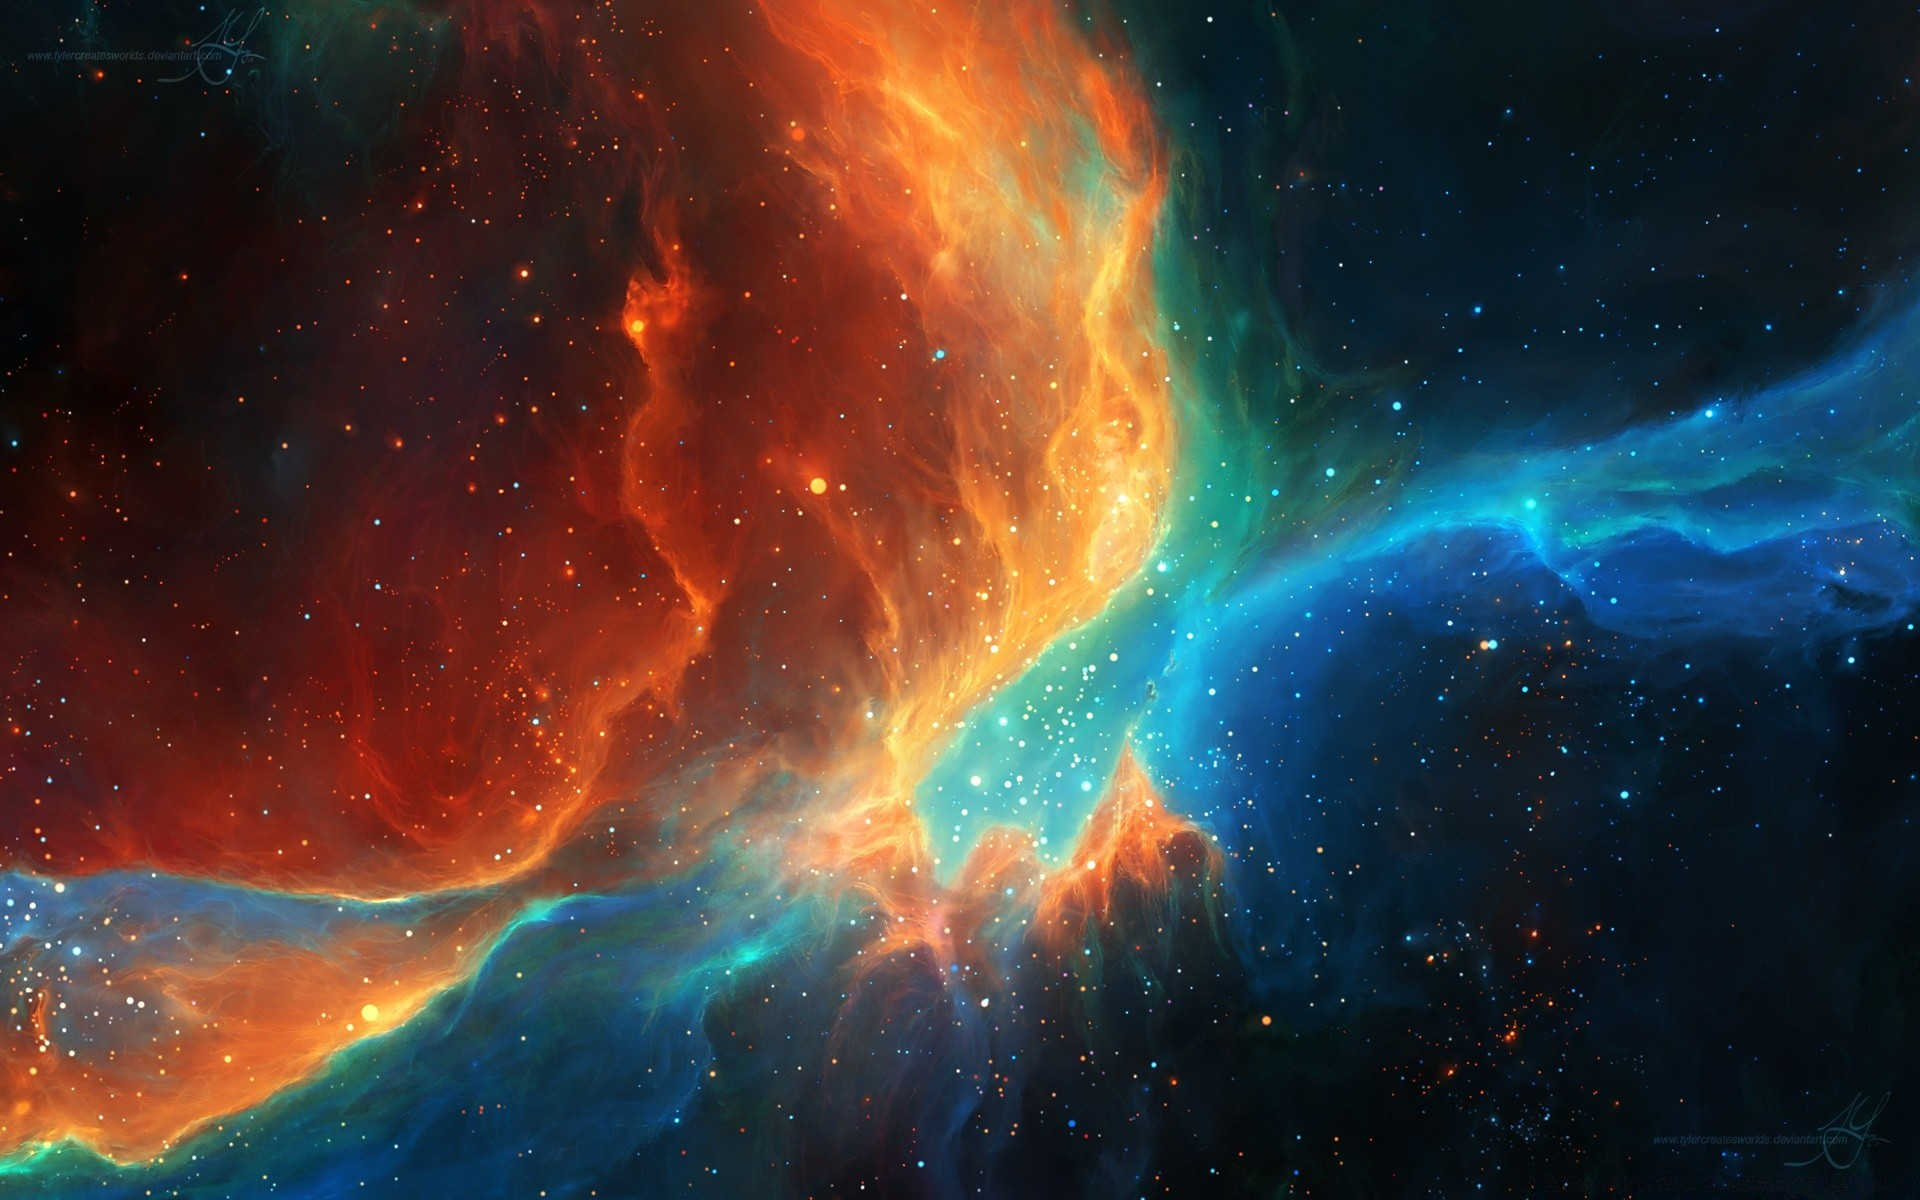 download nebula for windows 107818 6432 bits -